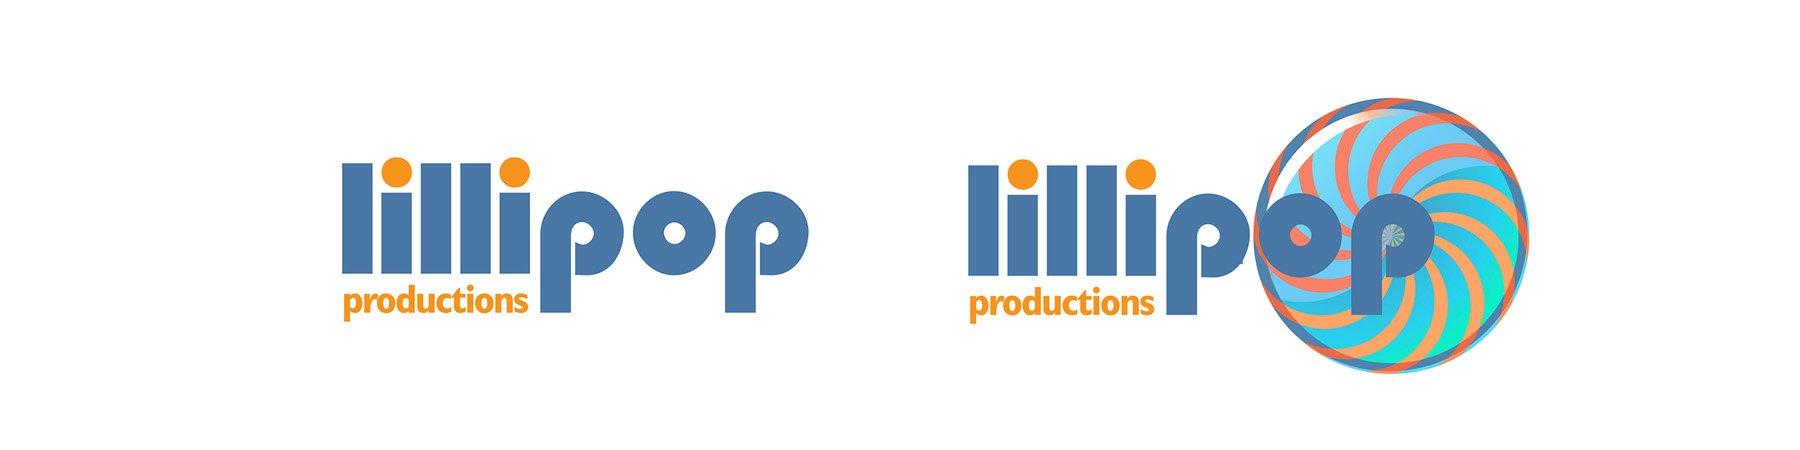 citywork designed entertainment company logos